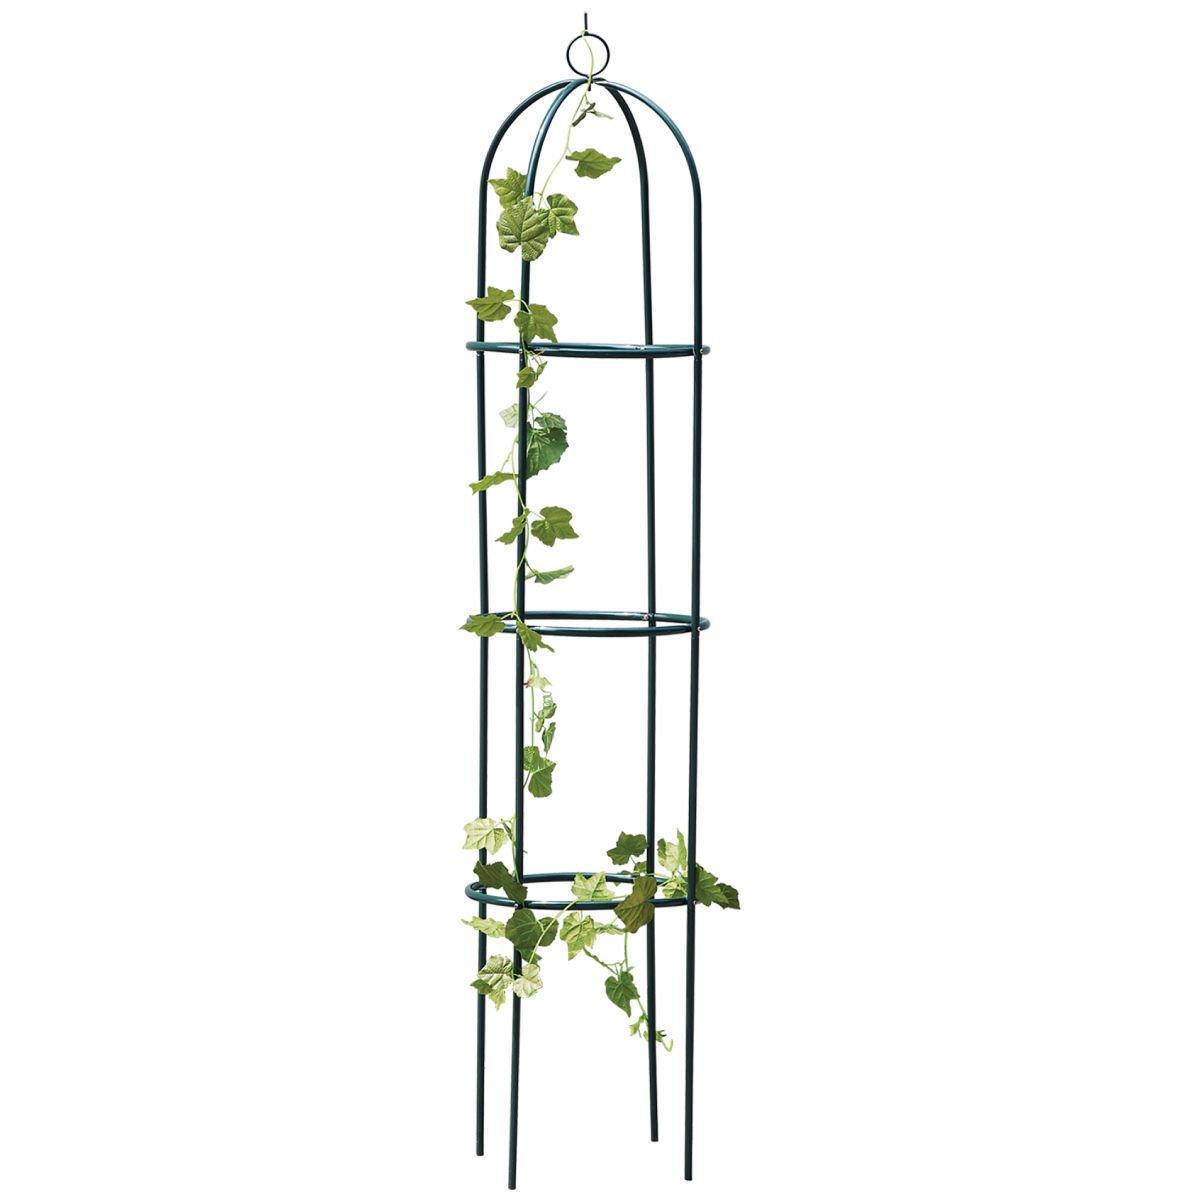 Unibos Black Metal Obelisk Climbing Plant Support Frame Ivy Trellis 1.9M